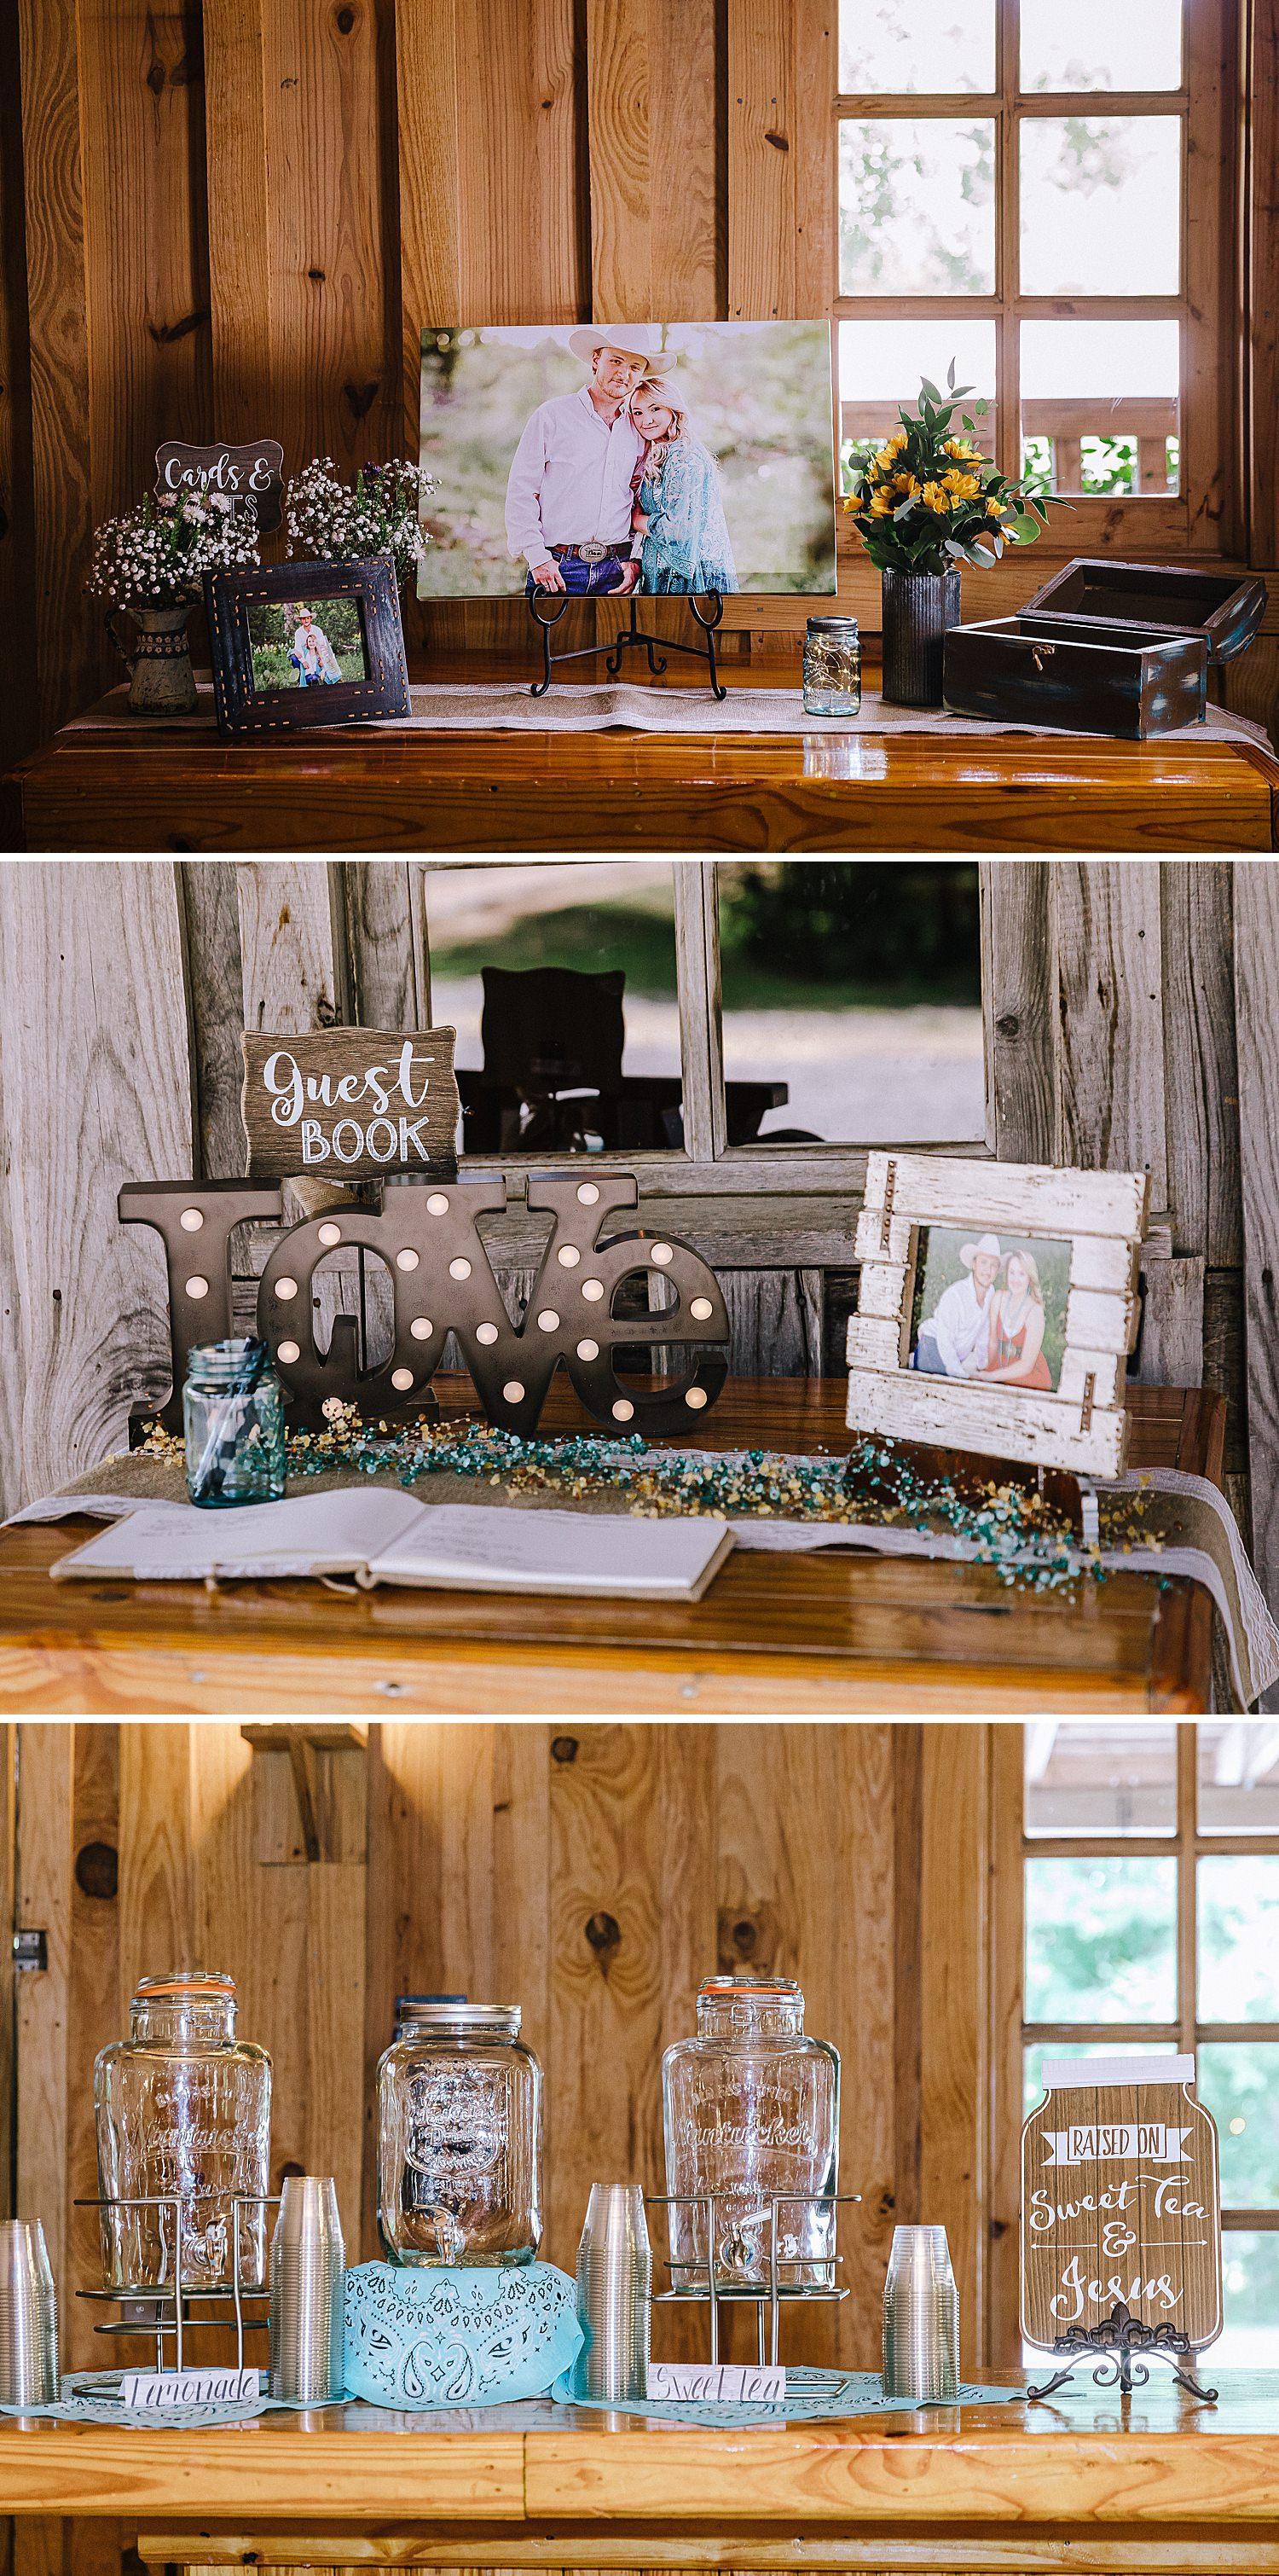 Carly-Barton-Photography-Old-Town-Texas-Rustic-Wedding-Photos-Sunflowers-Boots-Kyle-Texas_0014.jpg